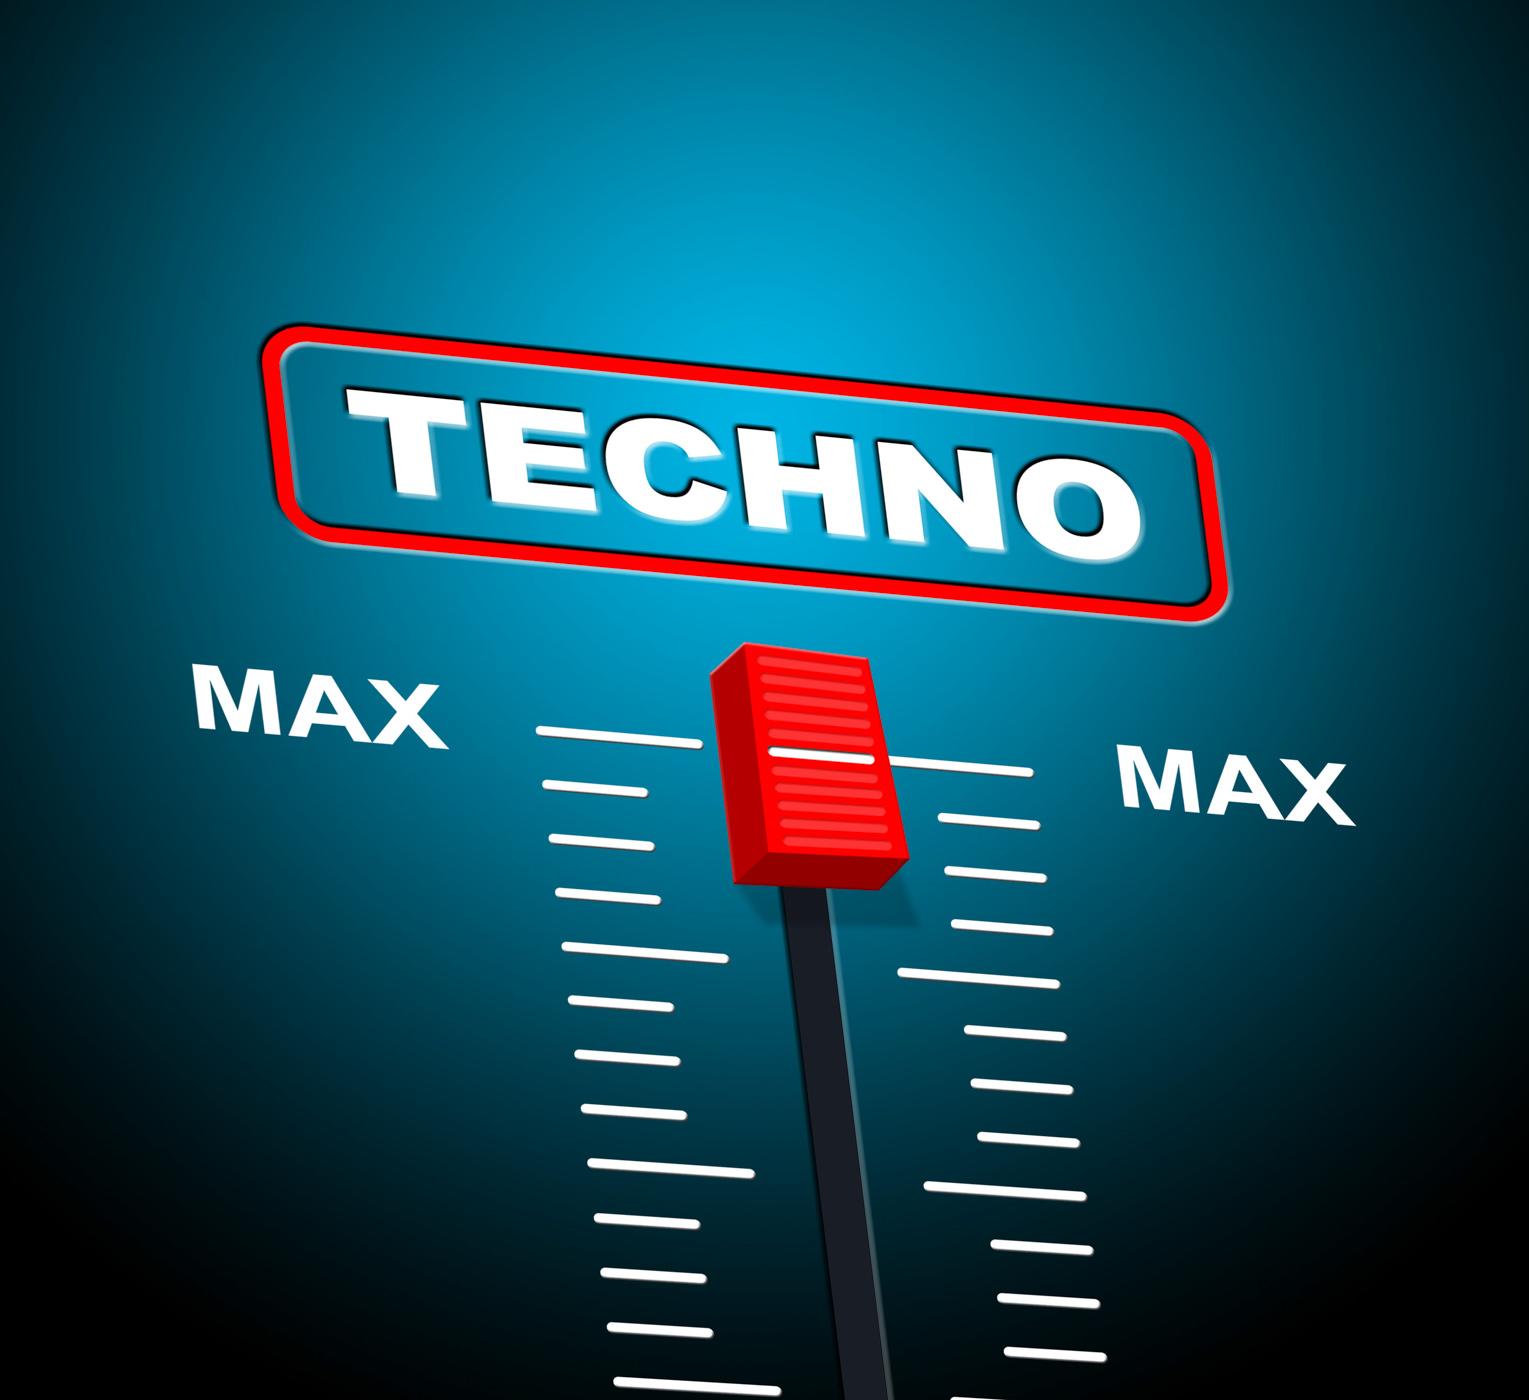 Techno music indicates sound track and celebration photo